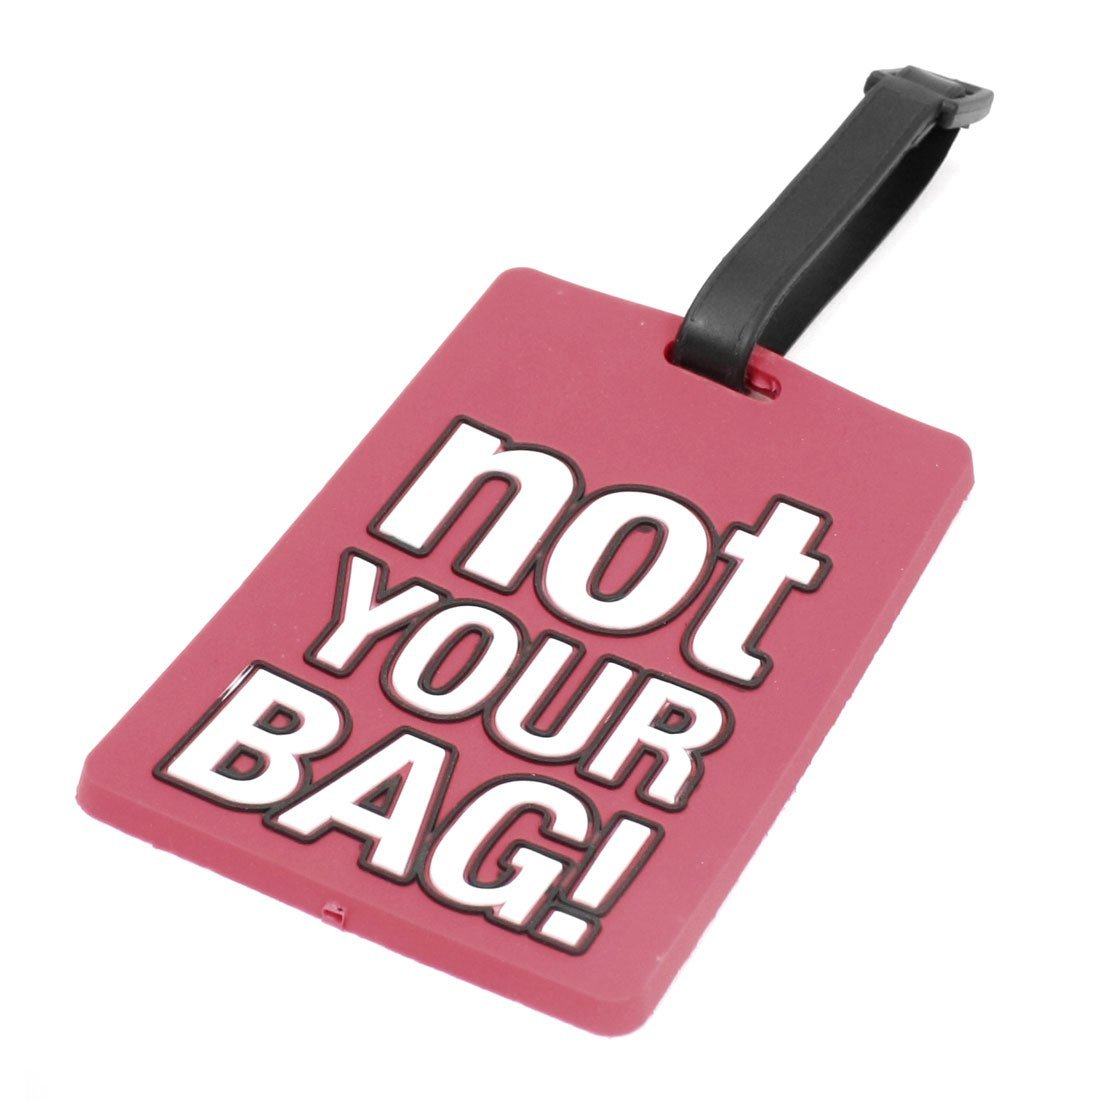 TEXU Name Address Label Watermelon Red Soft Plastic Not Your Bag Pattern vsen name address label blue soft plastic not your bag pattern luggage tag